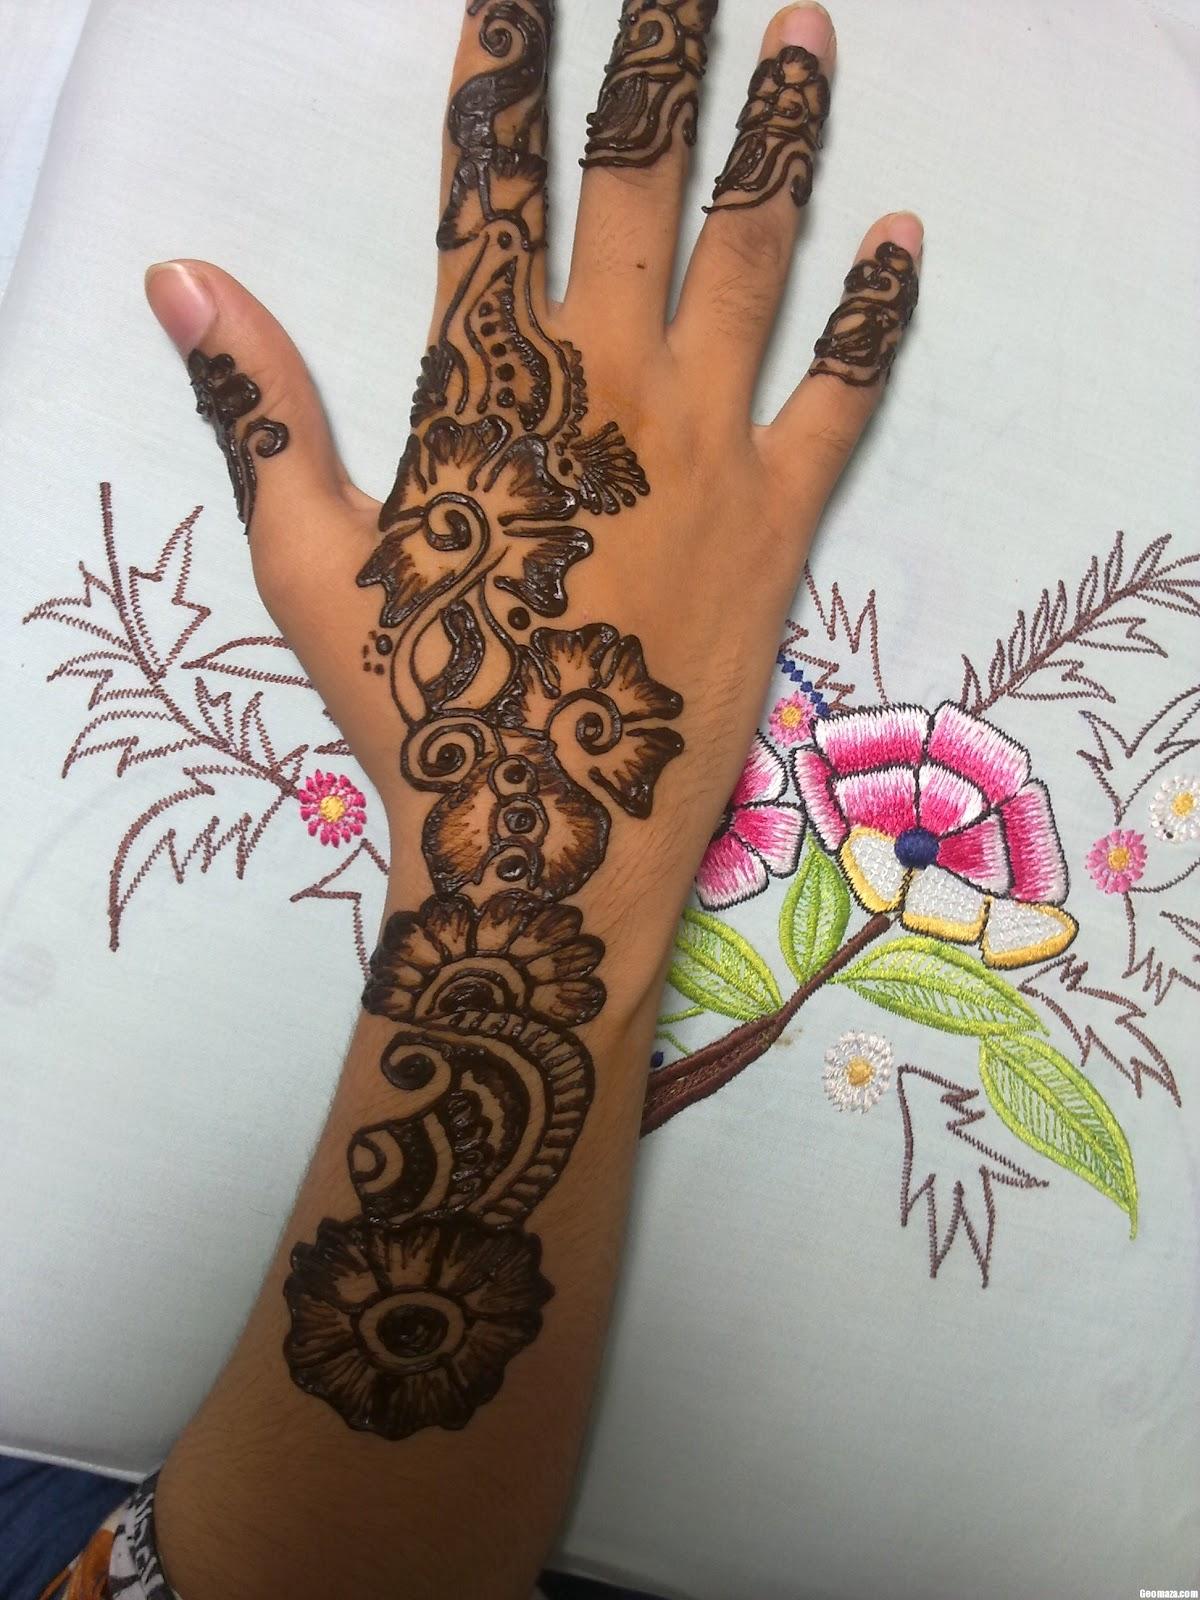 HAIDER MUNIR: New Mehndi Designs